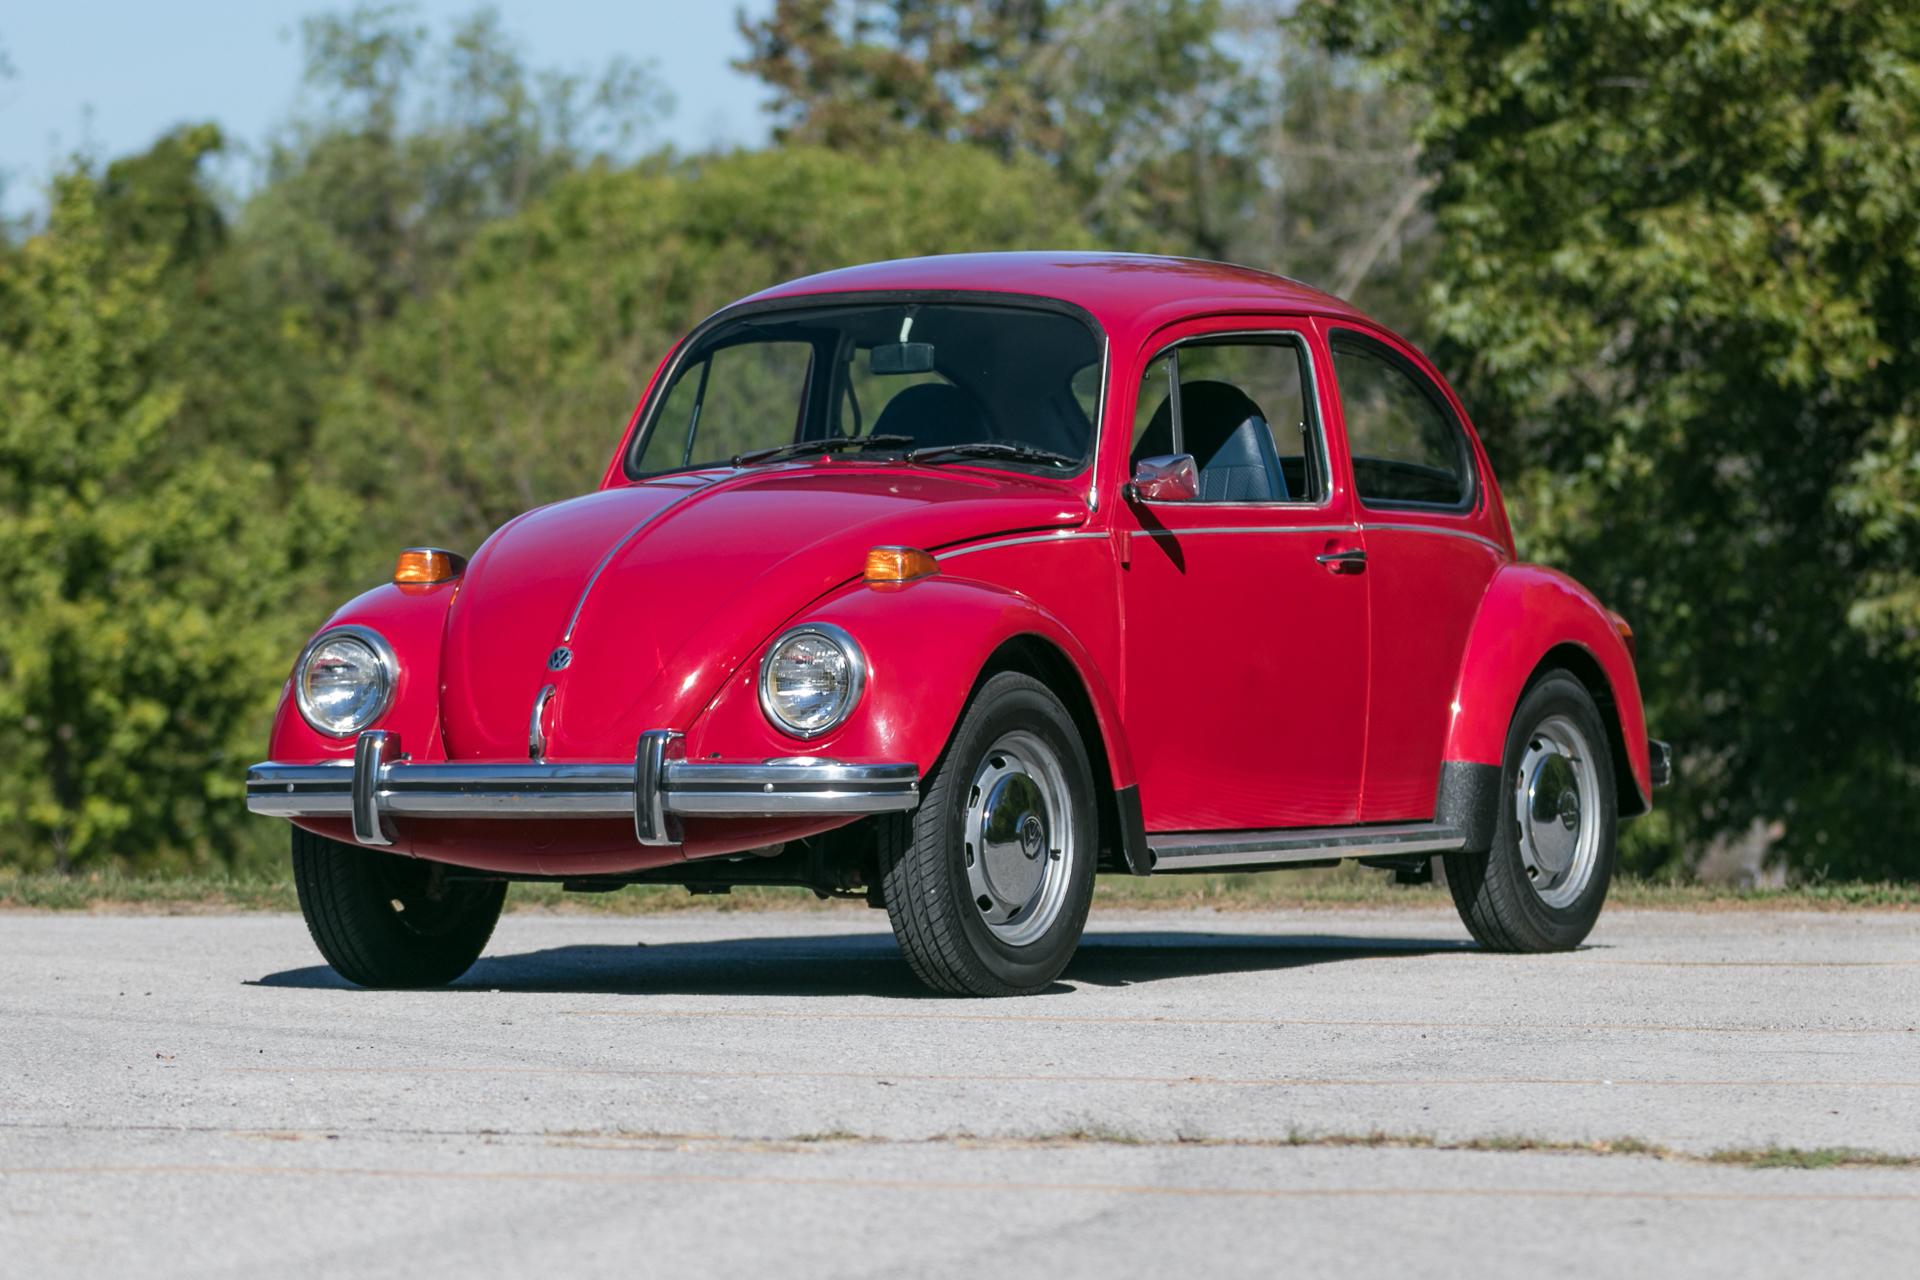 1973 volkswagen beetle fast lane classic cars. Black Bedroom Furniture Sets. Home Design Ideas